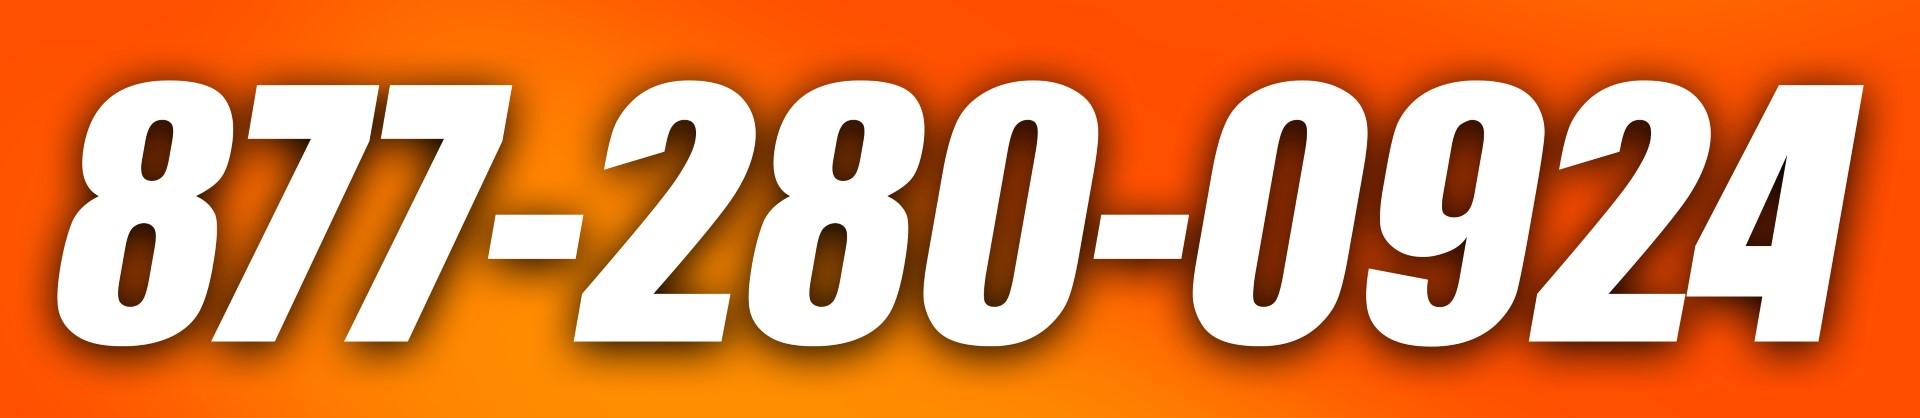 877-280-0924